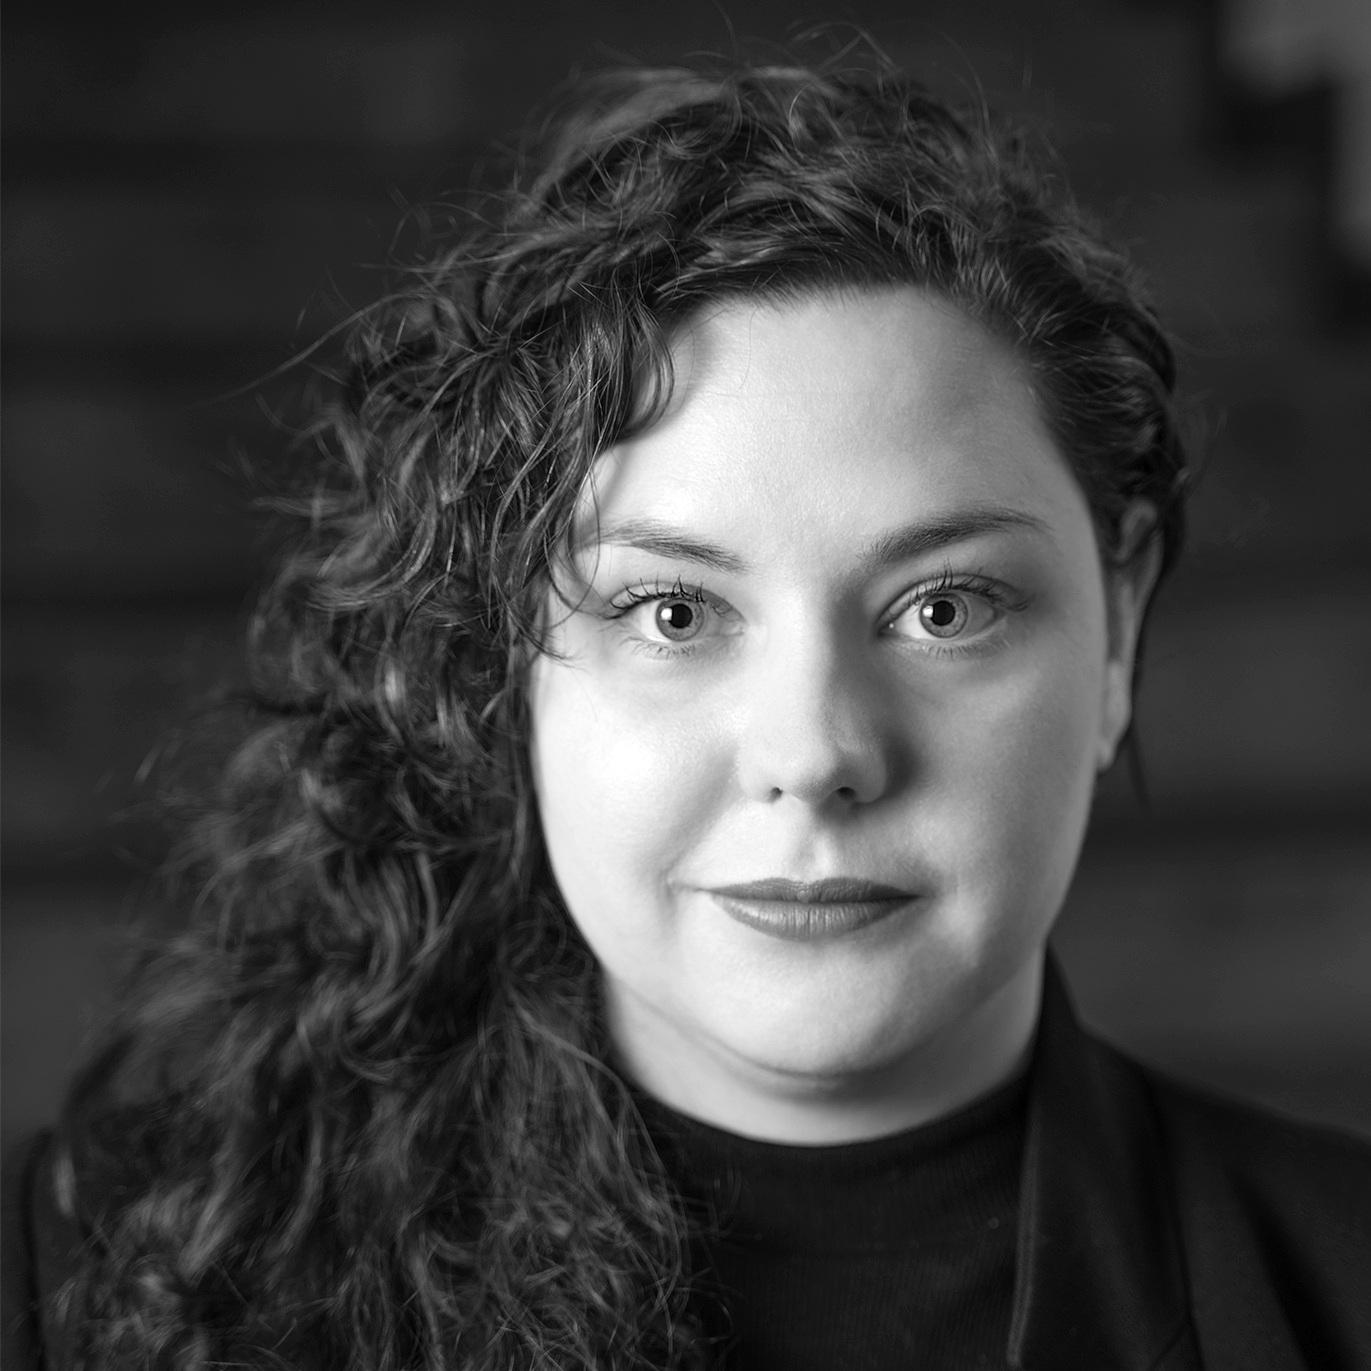 Annabelle Cummerow - Communication Effectiveness, Brand Codes & Visual Branding